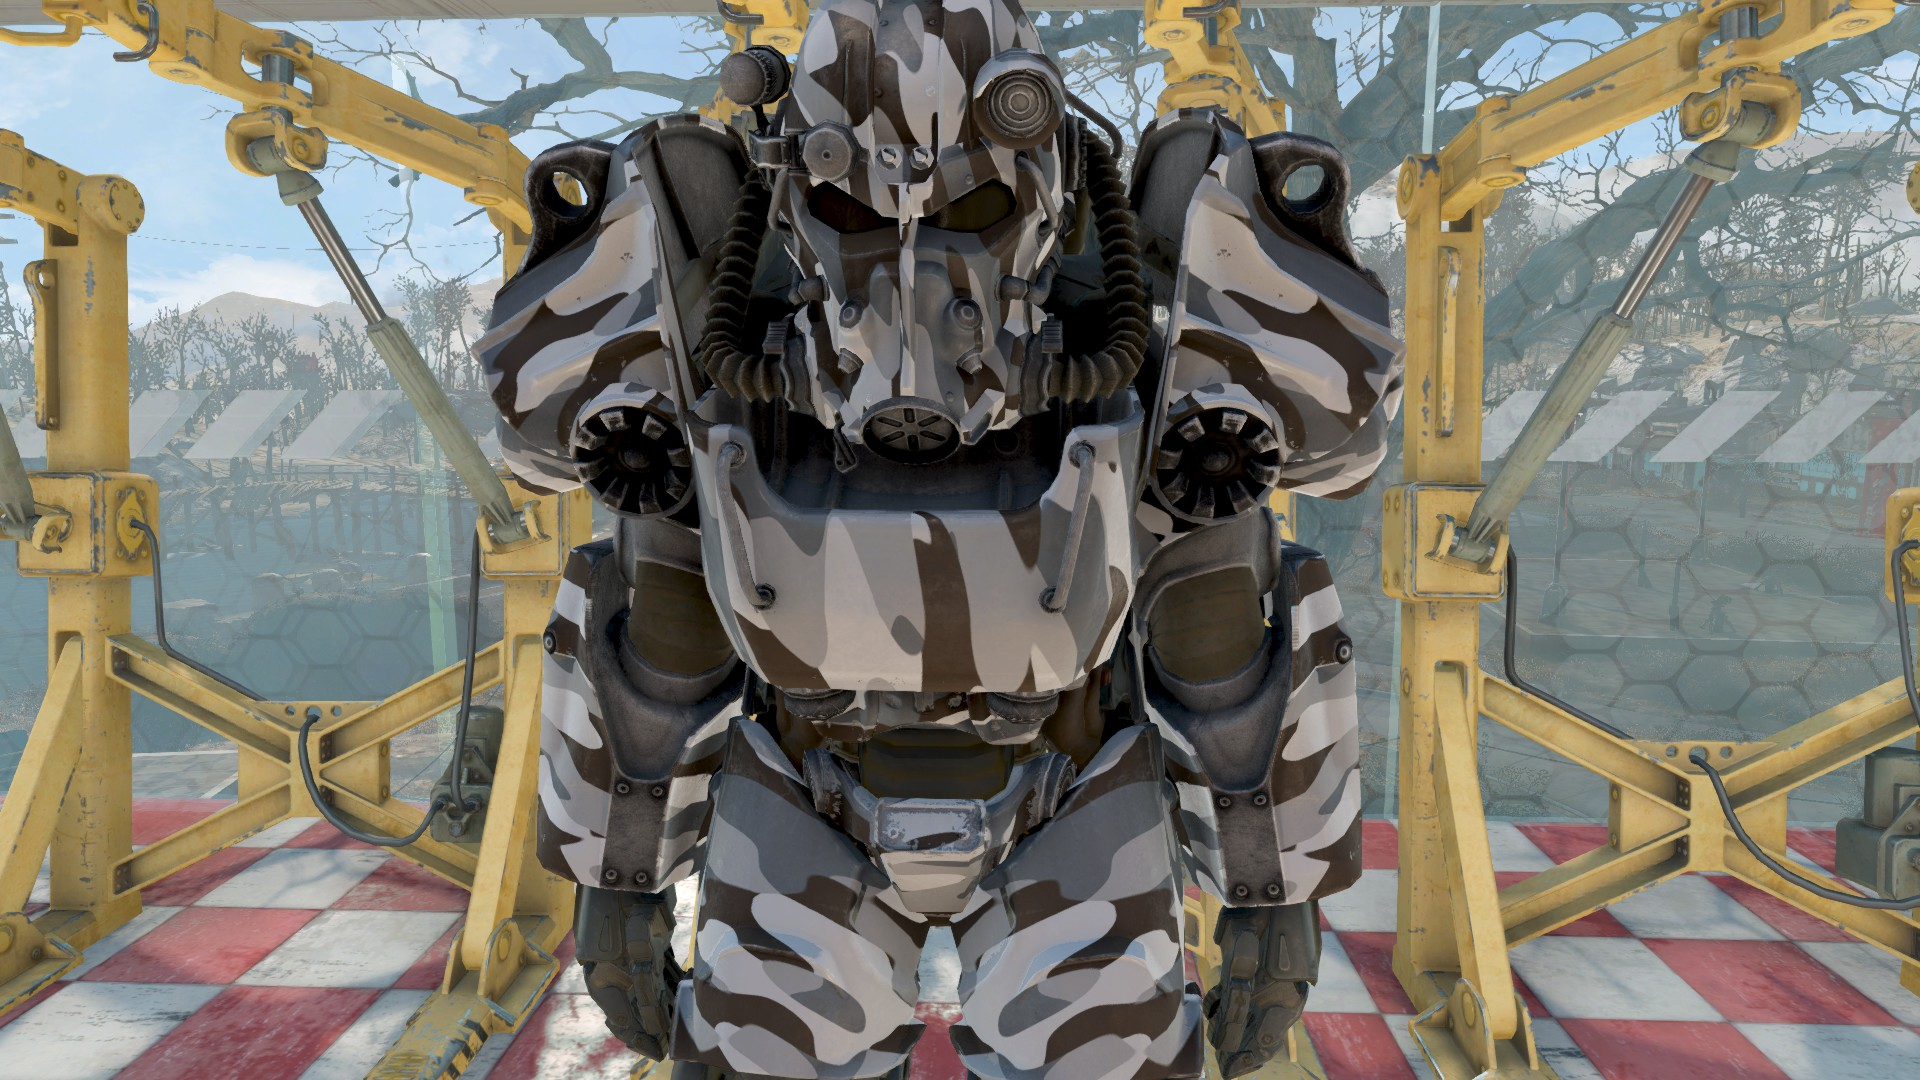 20181206144912_1.jpg - Fallout 4